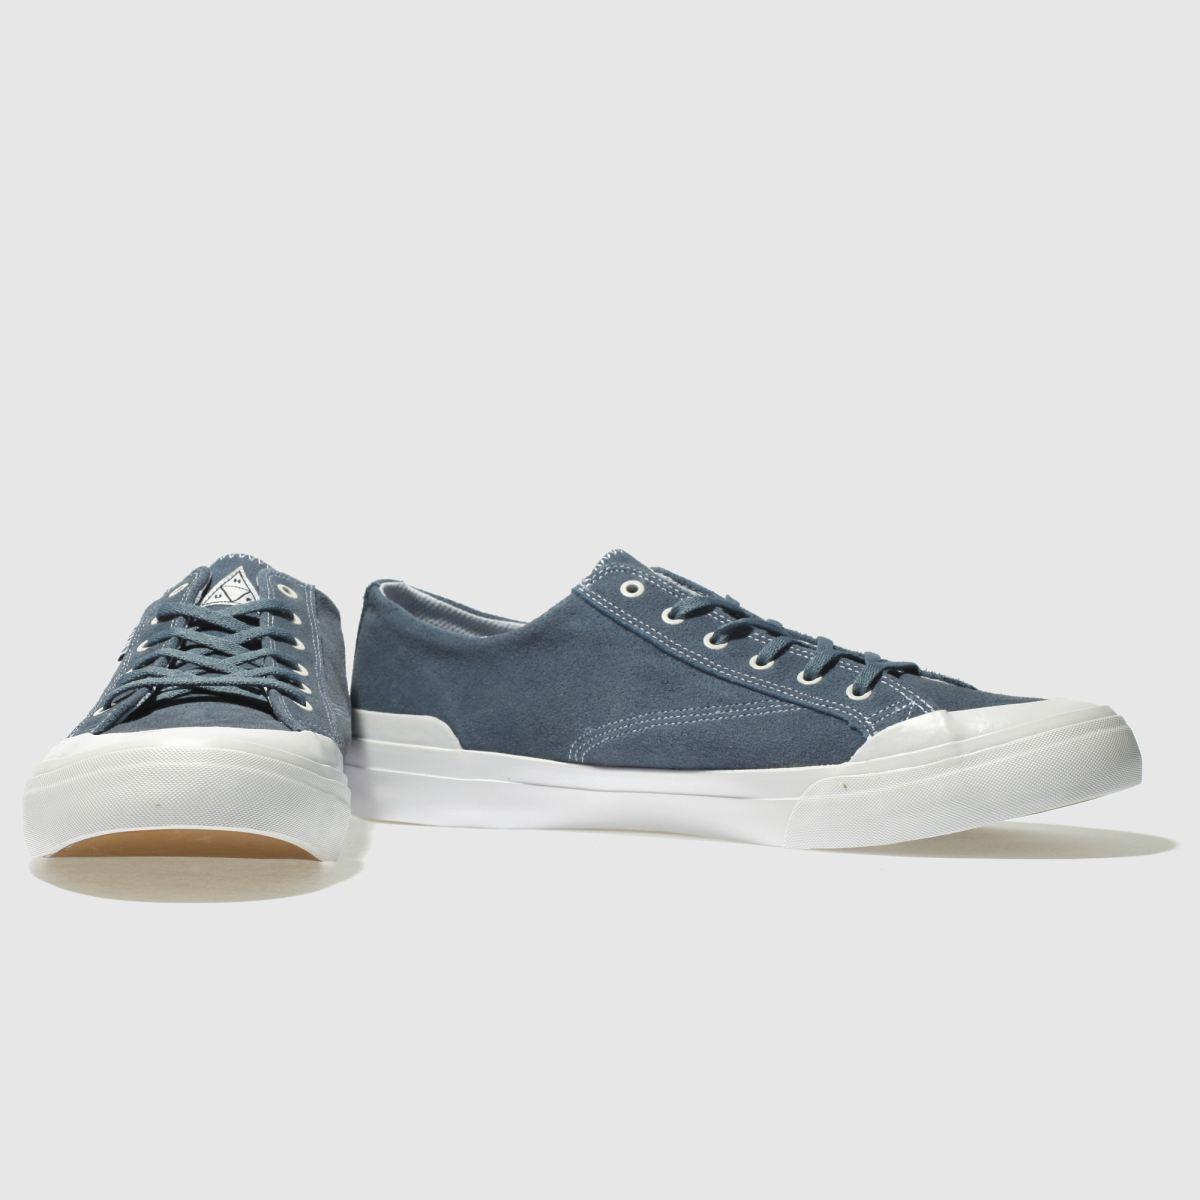 Herren Blau huf Classic Lo Sneaker   Schuhe schuh Gute Qualität beliebte Schuhe   c6f4bc